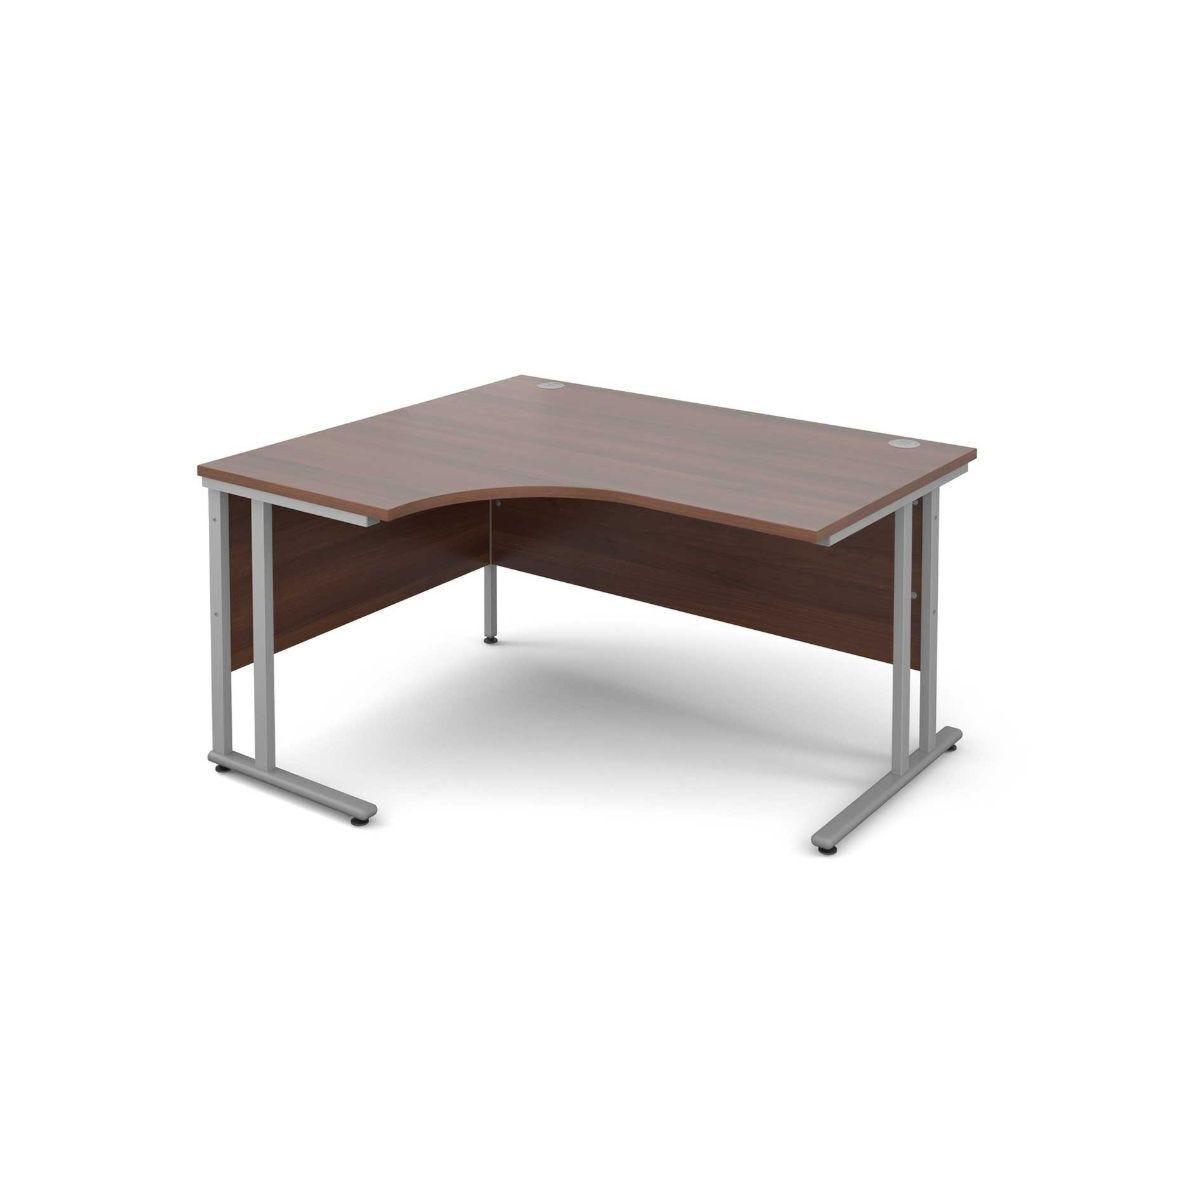 Maestro 25 Left Hand Ergonomic 1400 Desk with Silver Legs Walnut